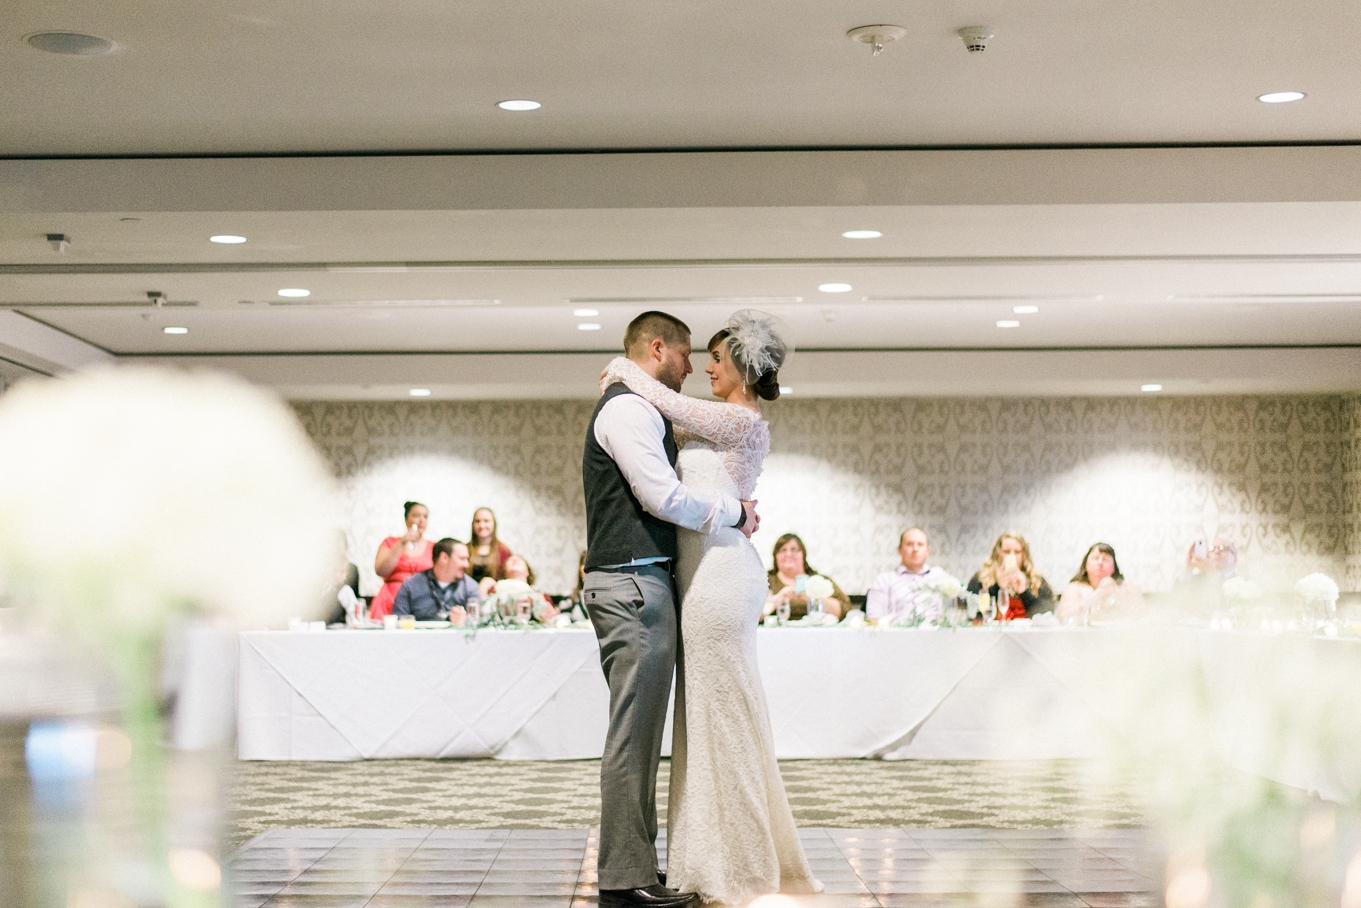 the-nines-portland-wedding-photographer-shelley-marie-photo-301.jpg